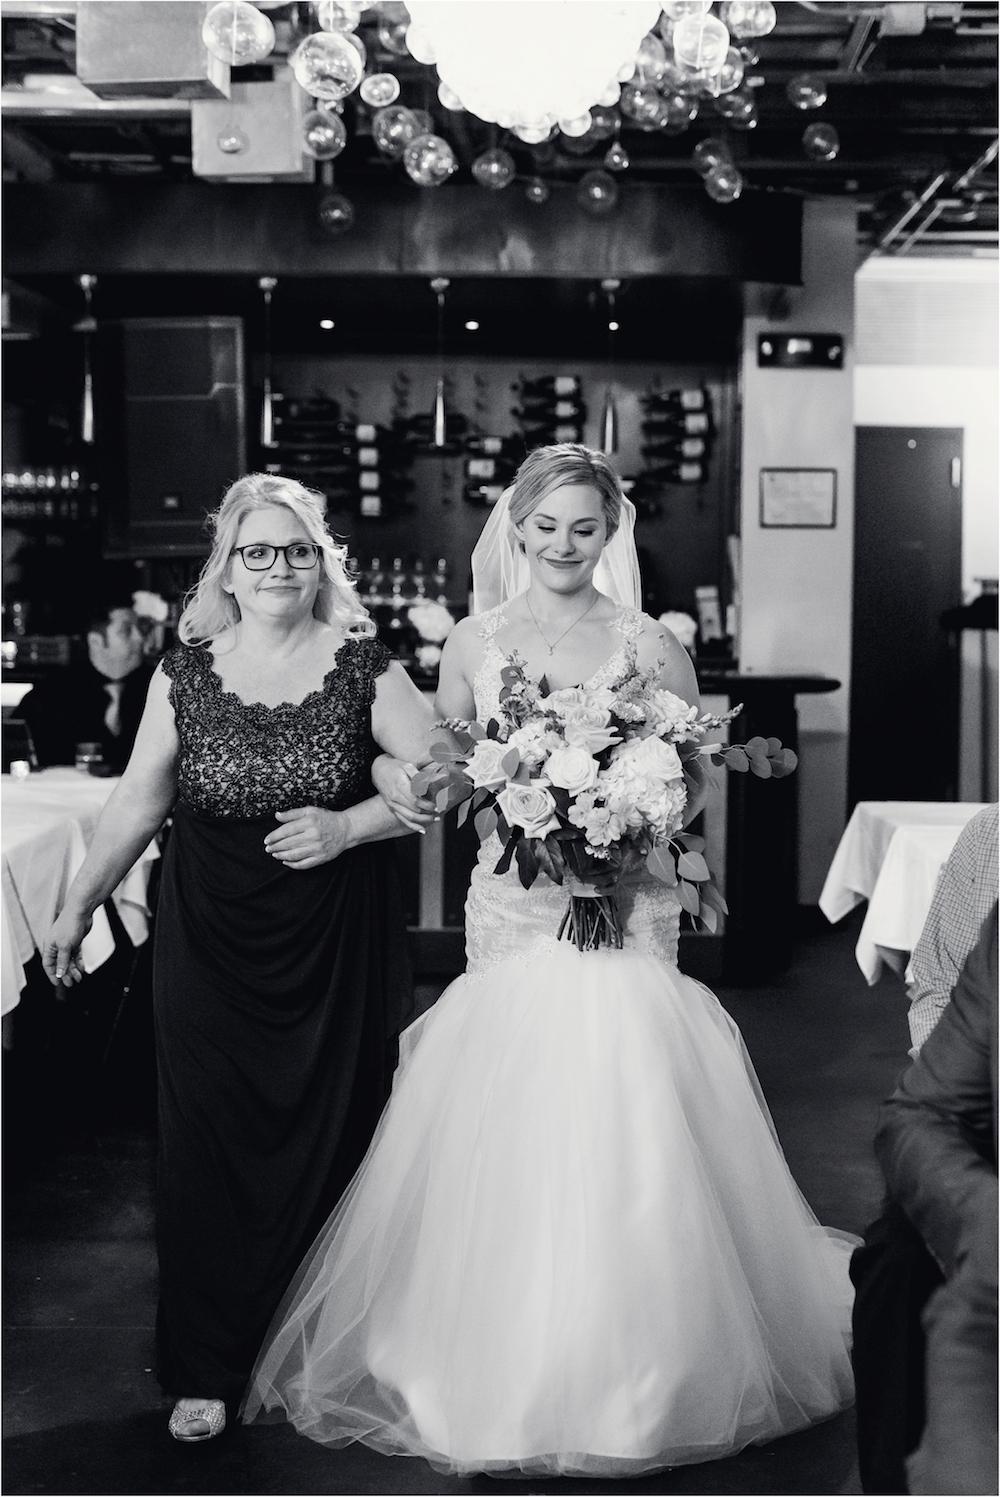 downtown-ann-arbor-university-of-michigan-vinology-brunch-wedding-photo-150.jpg